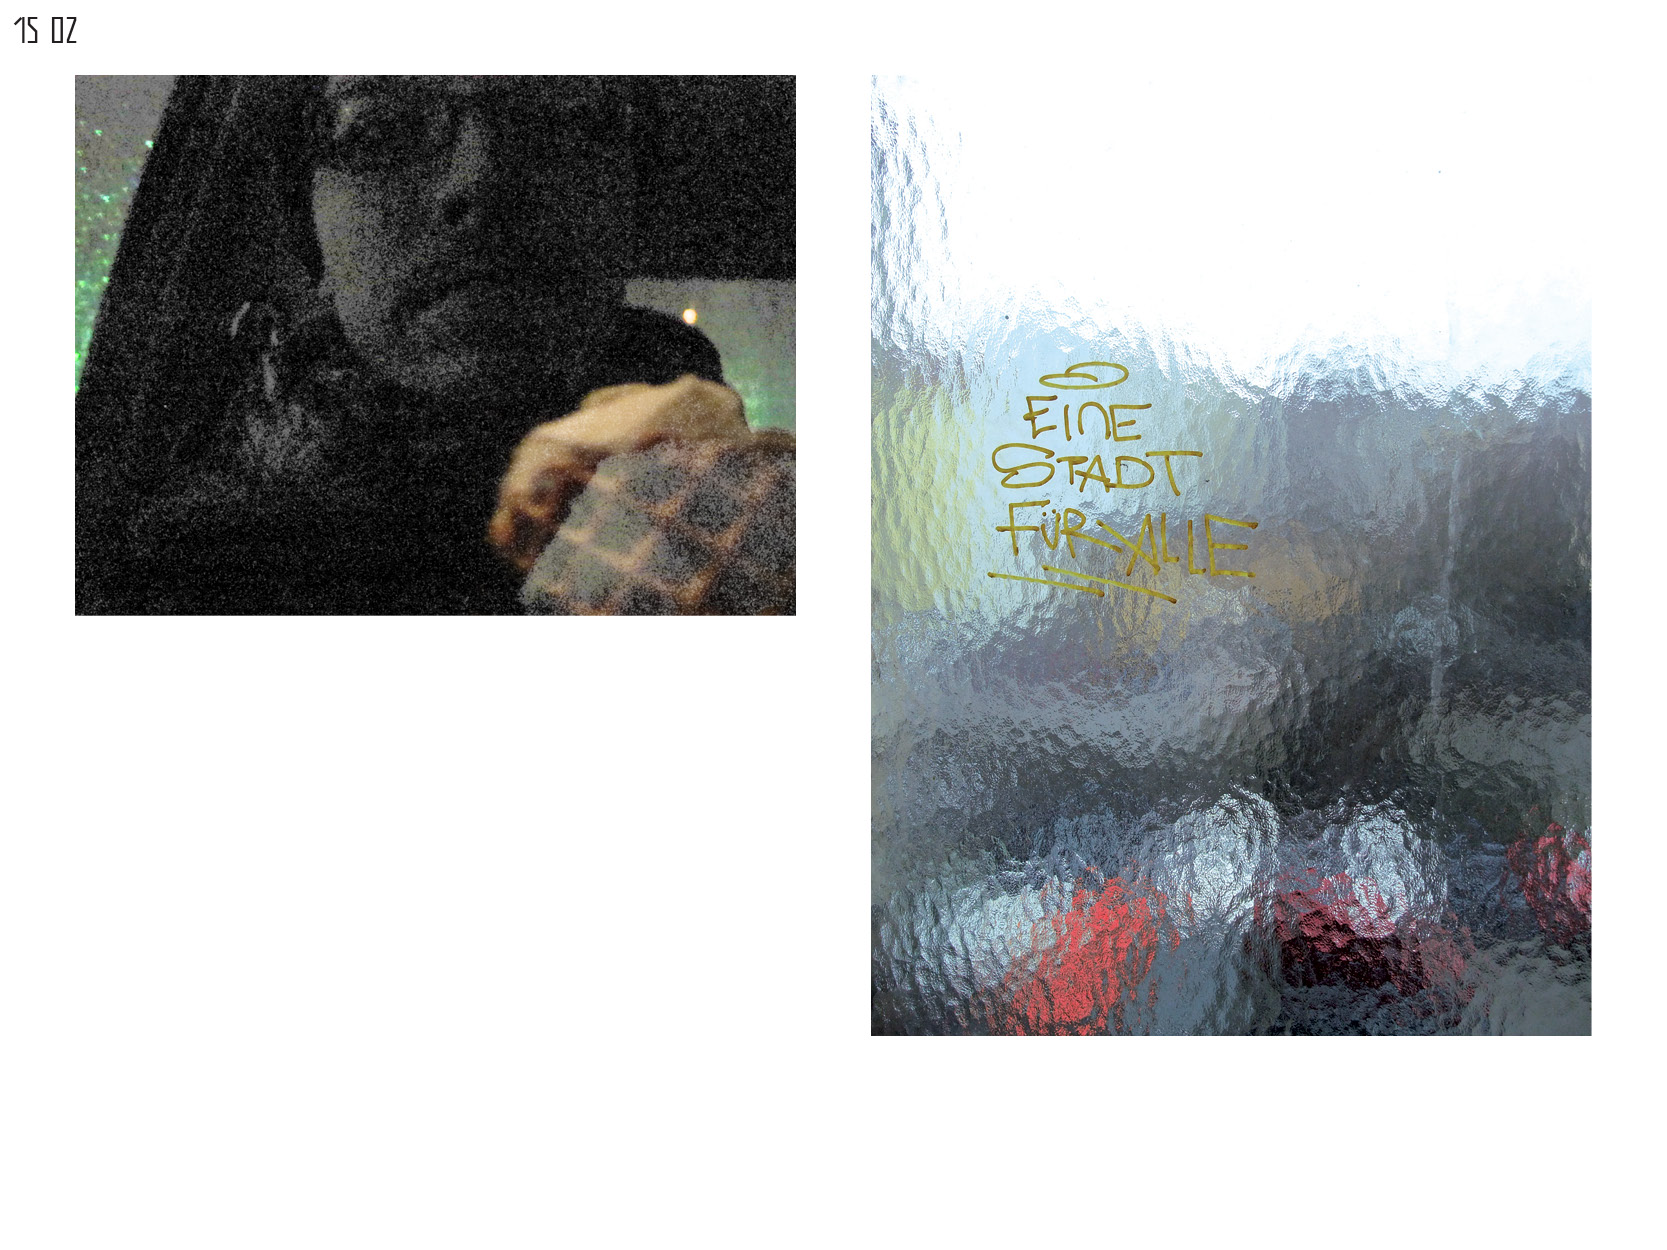 Gerrit-Schweiger-Dialog-Städte-Paris-Berlin-Jessica-Blank-Experiment-Fotoserie-Tagebuch-visuelle-Kommunikation-103